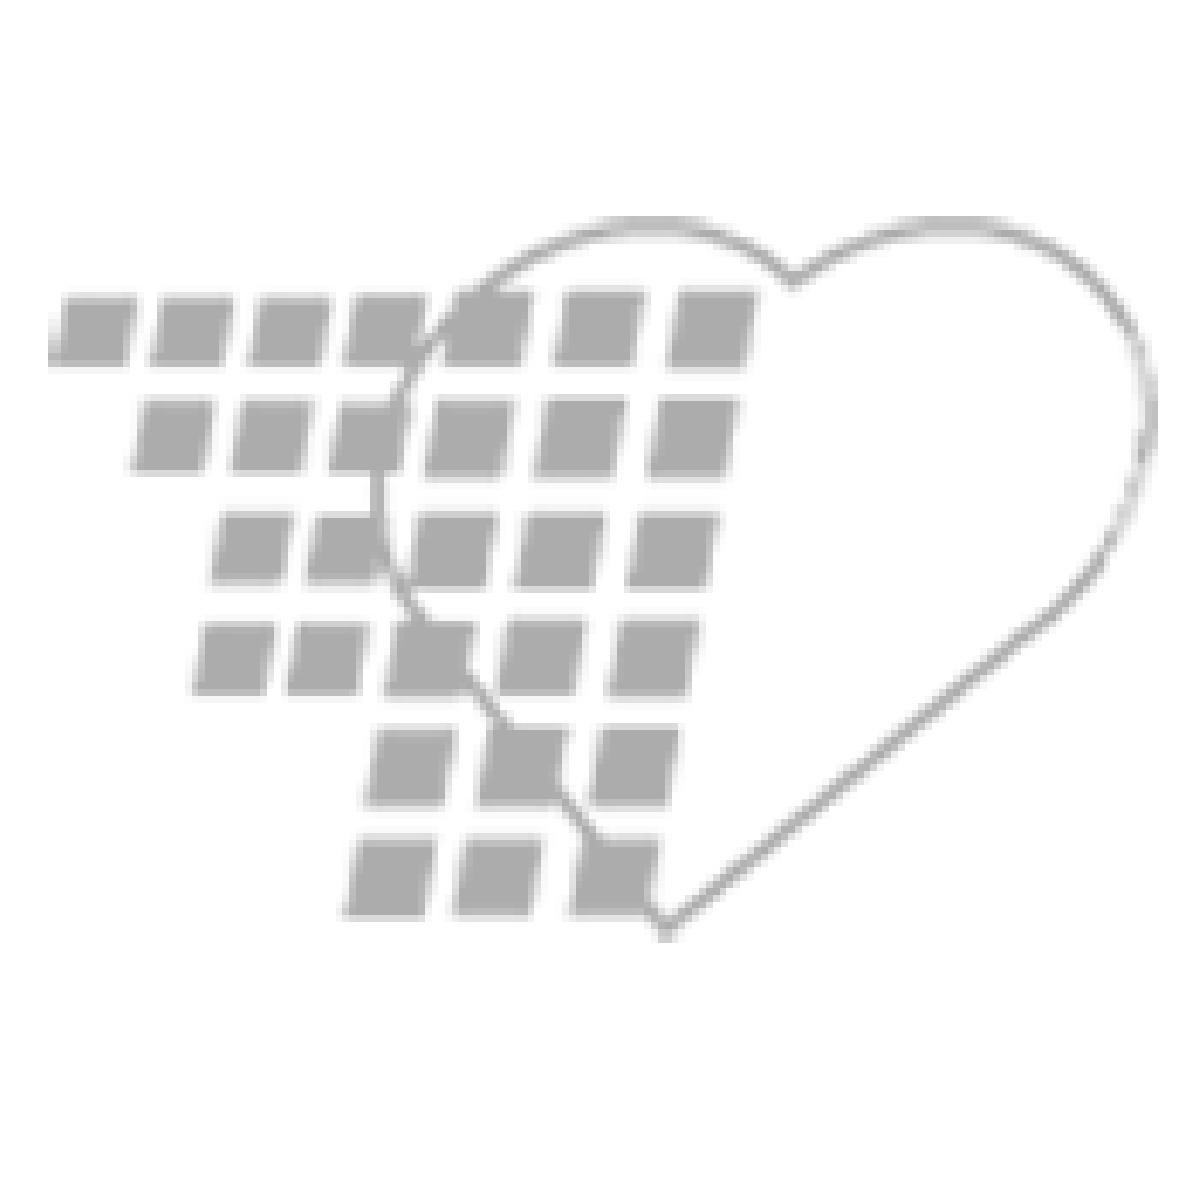 11-81-8515 - Pulse Ox Simulator